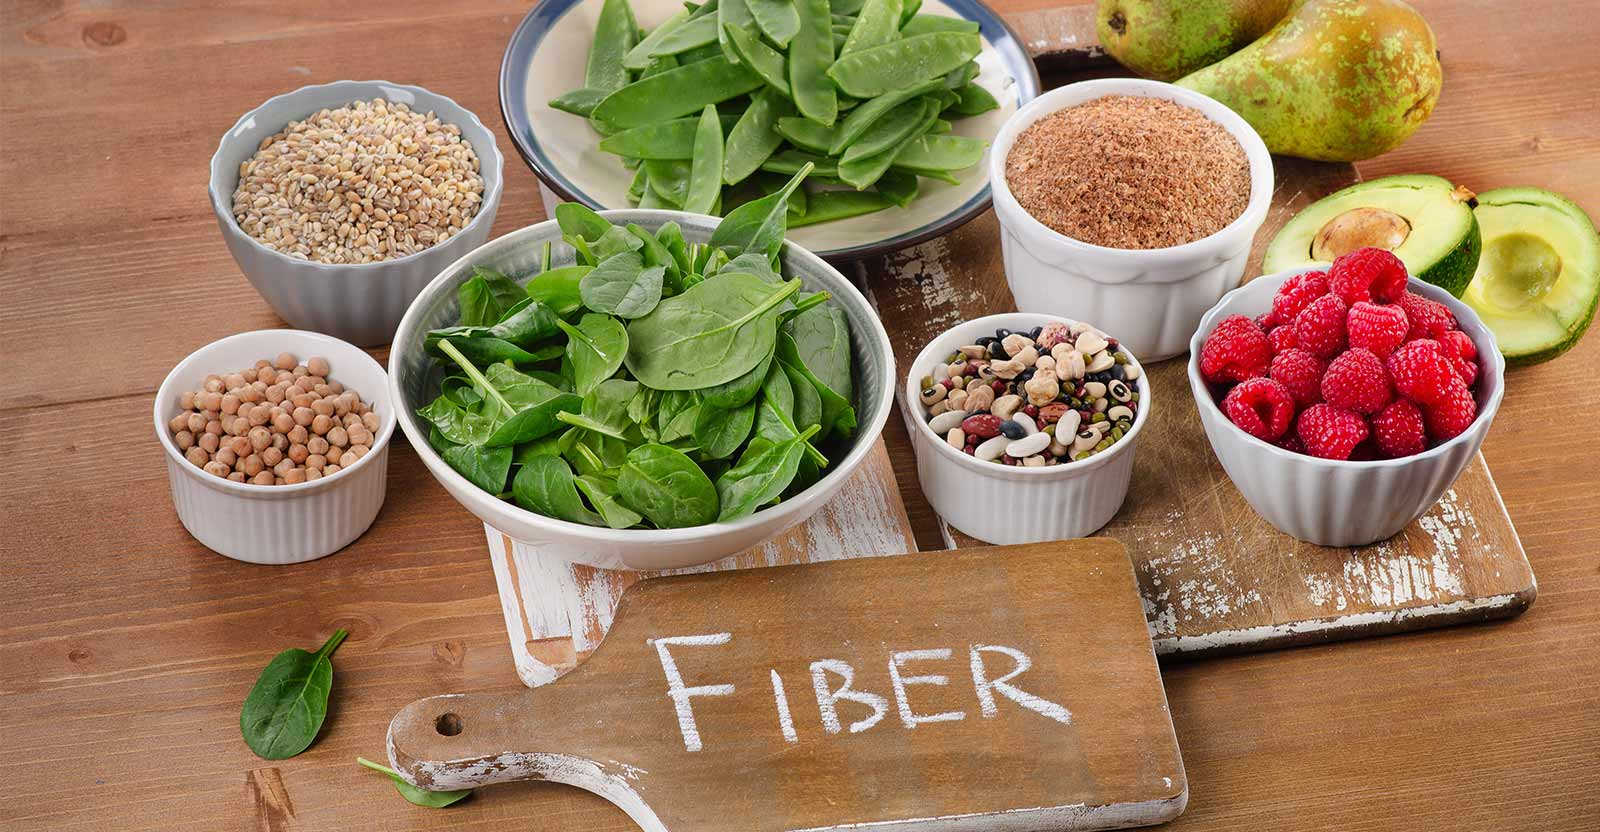 health benefits of fiber